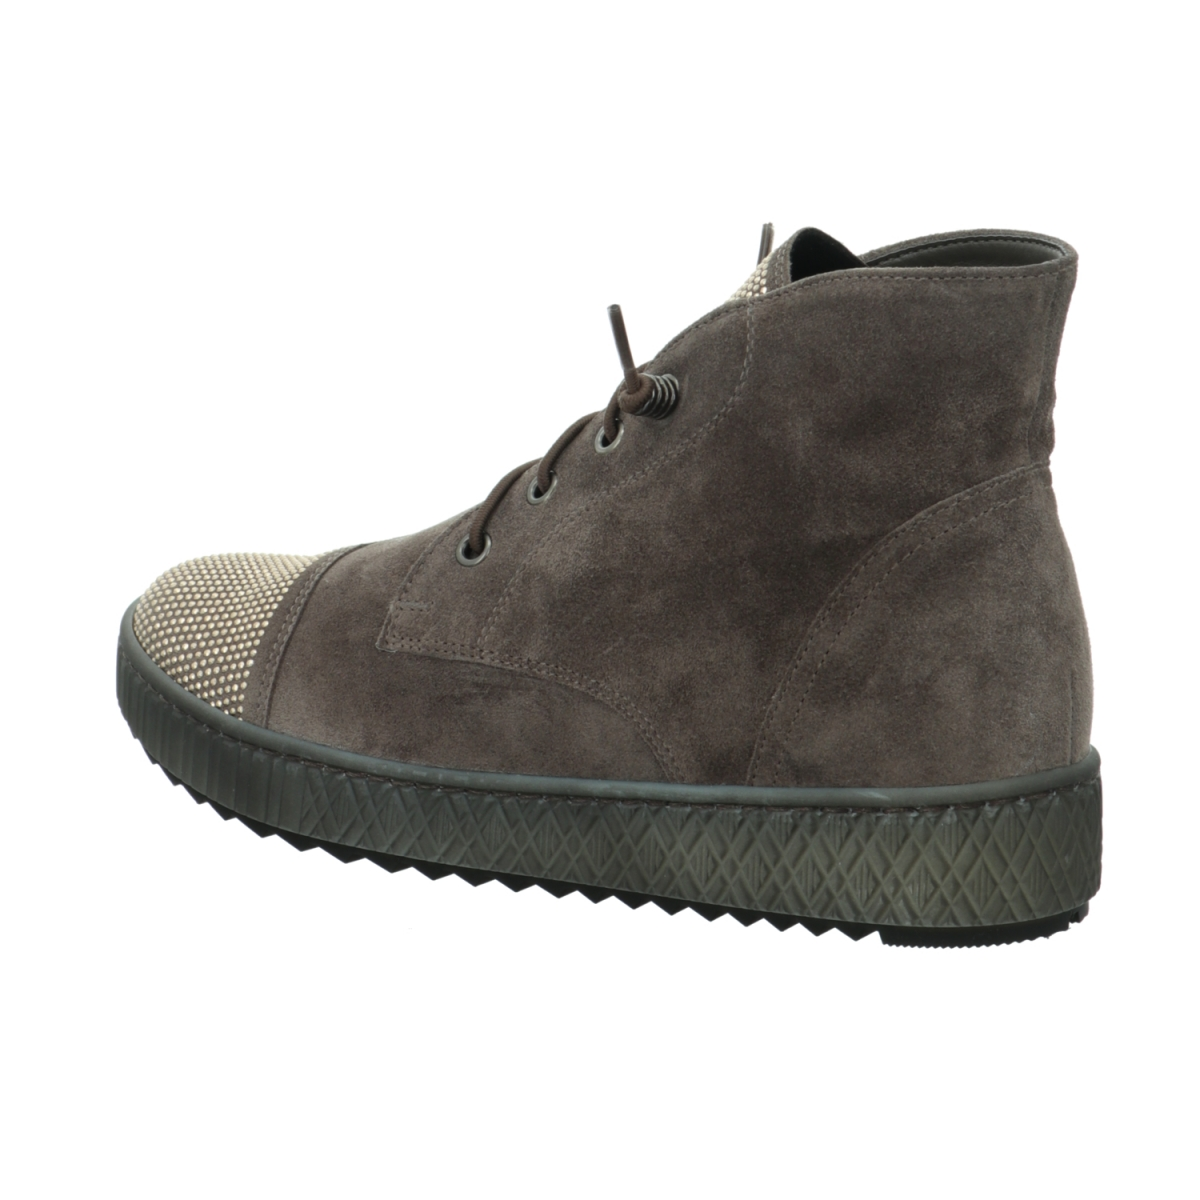 b8597c89deed Gabor - Sneaker Gabor - Sneaker Gabor - Sneaker ...